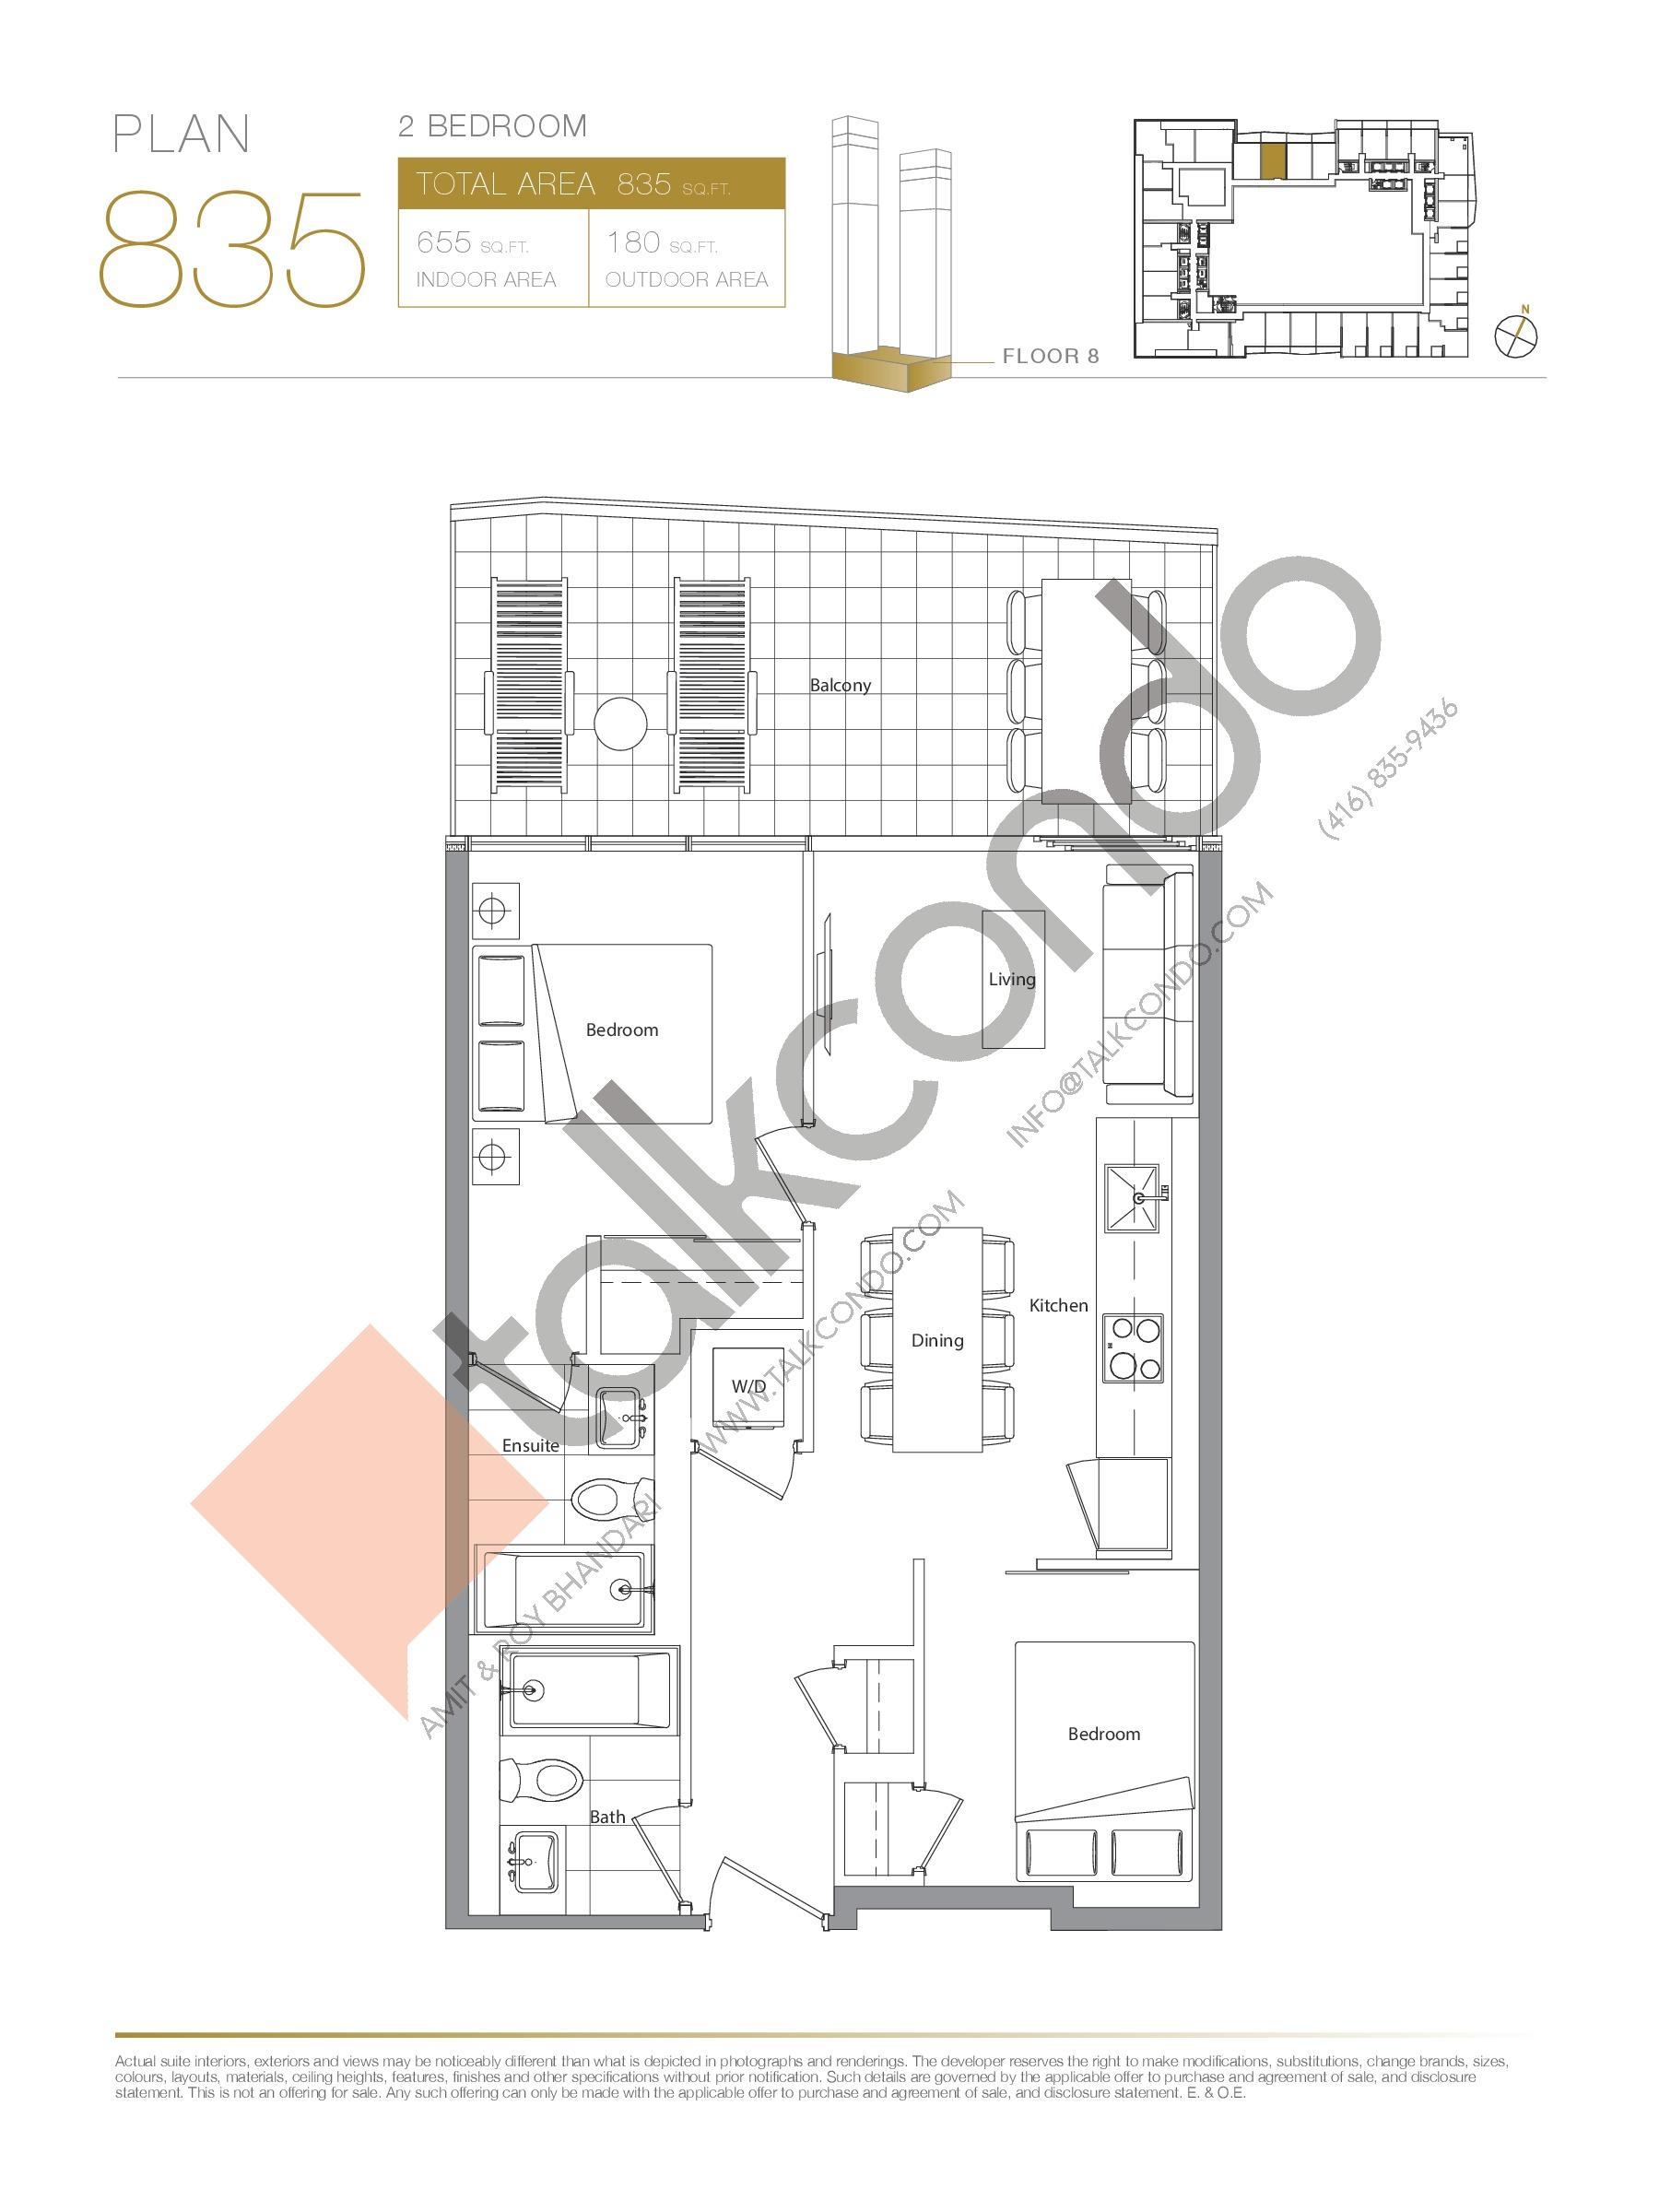 Plan 835 Floor Plan at Concord Canada House Condos - 655 sq.ft